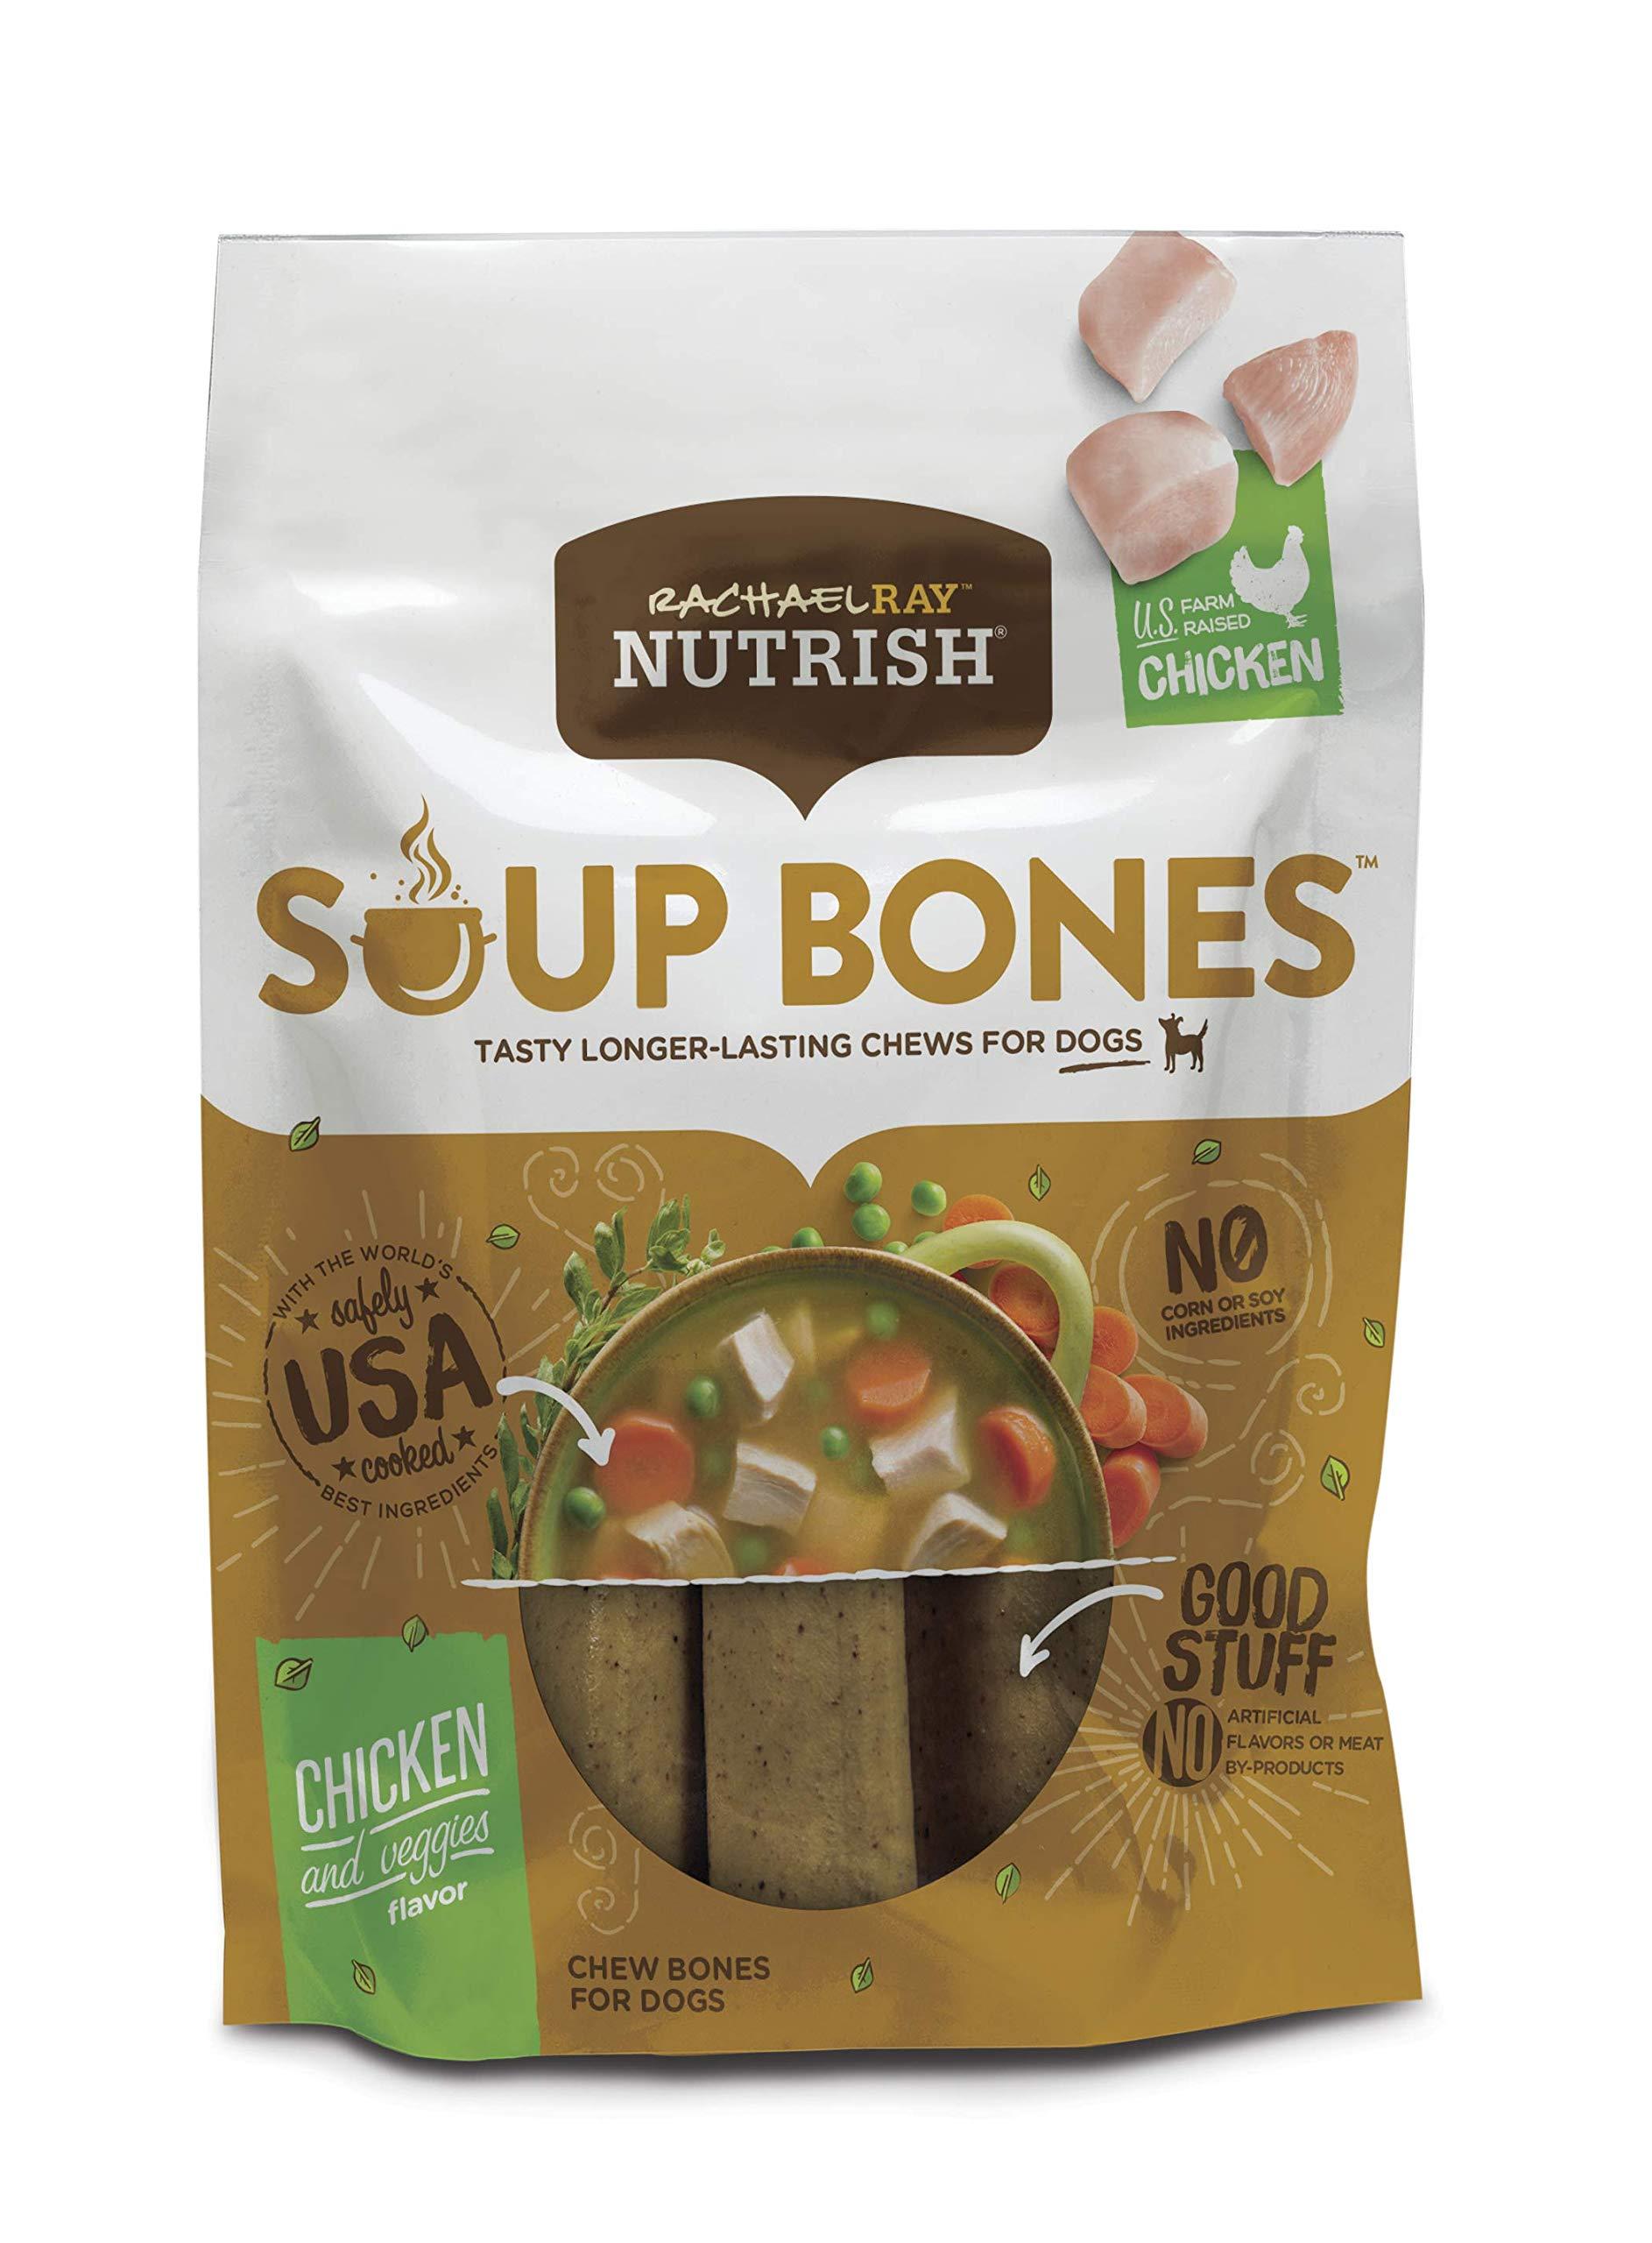 Rachael Ray Nutrish Soup Bones Dog Treats, Real Chicken & Veggies Flavor, 6.3 Oz. Bag (Pack Of 8)